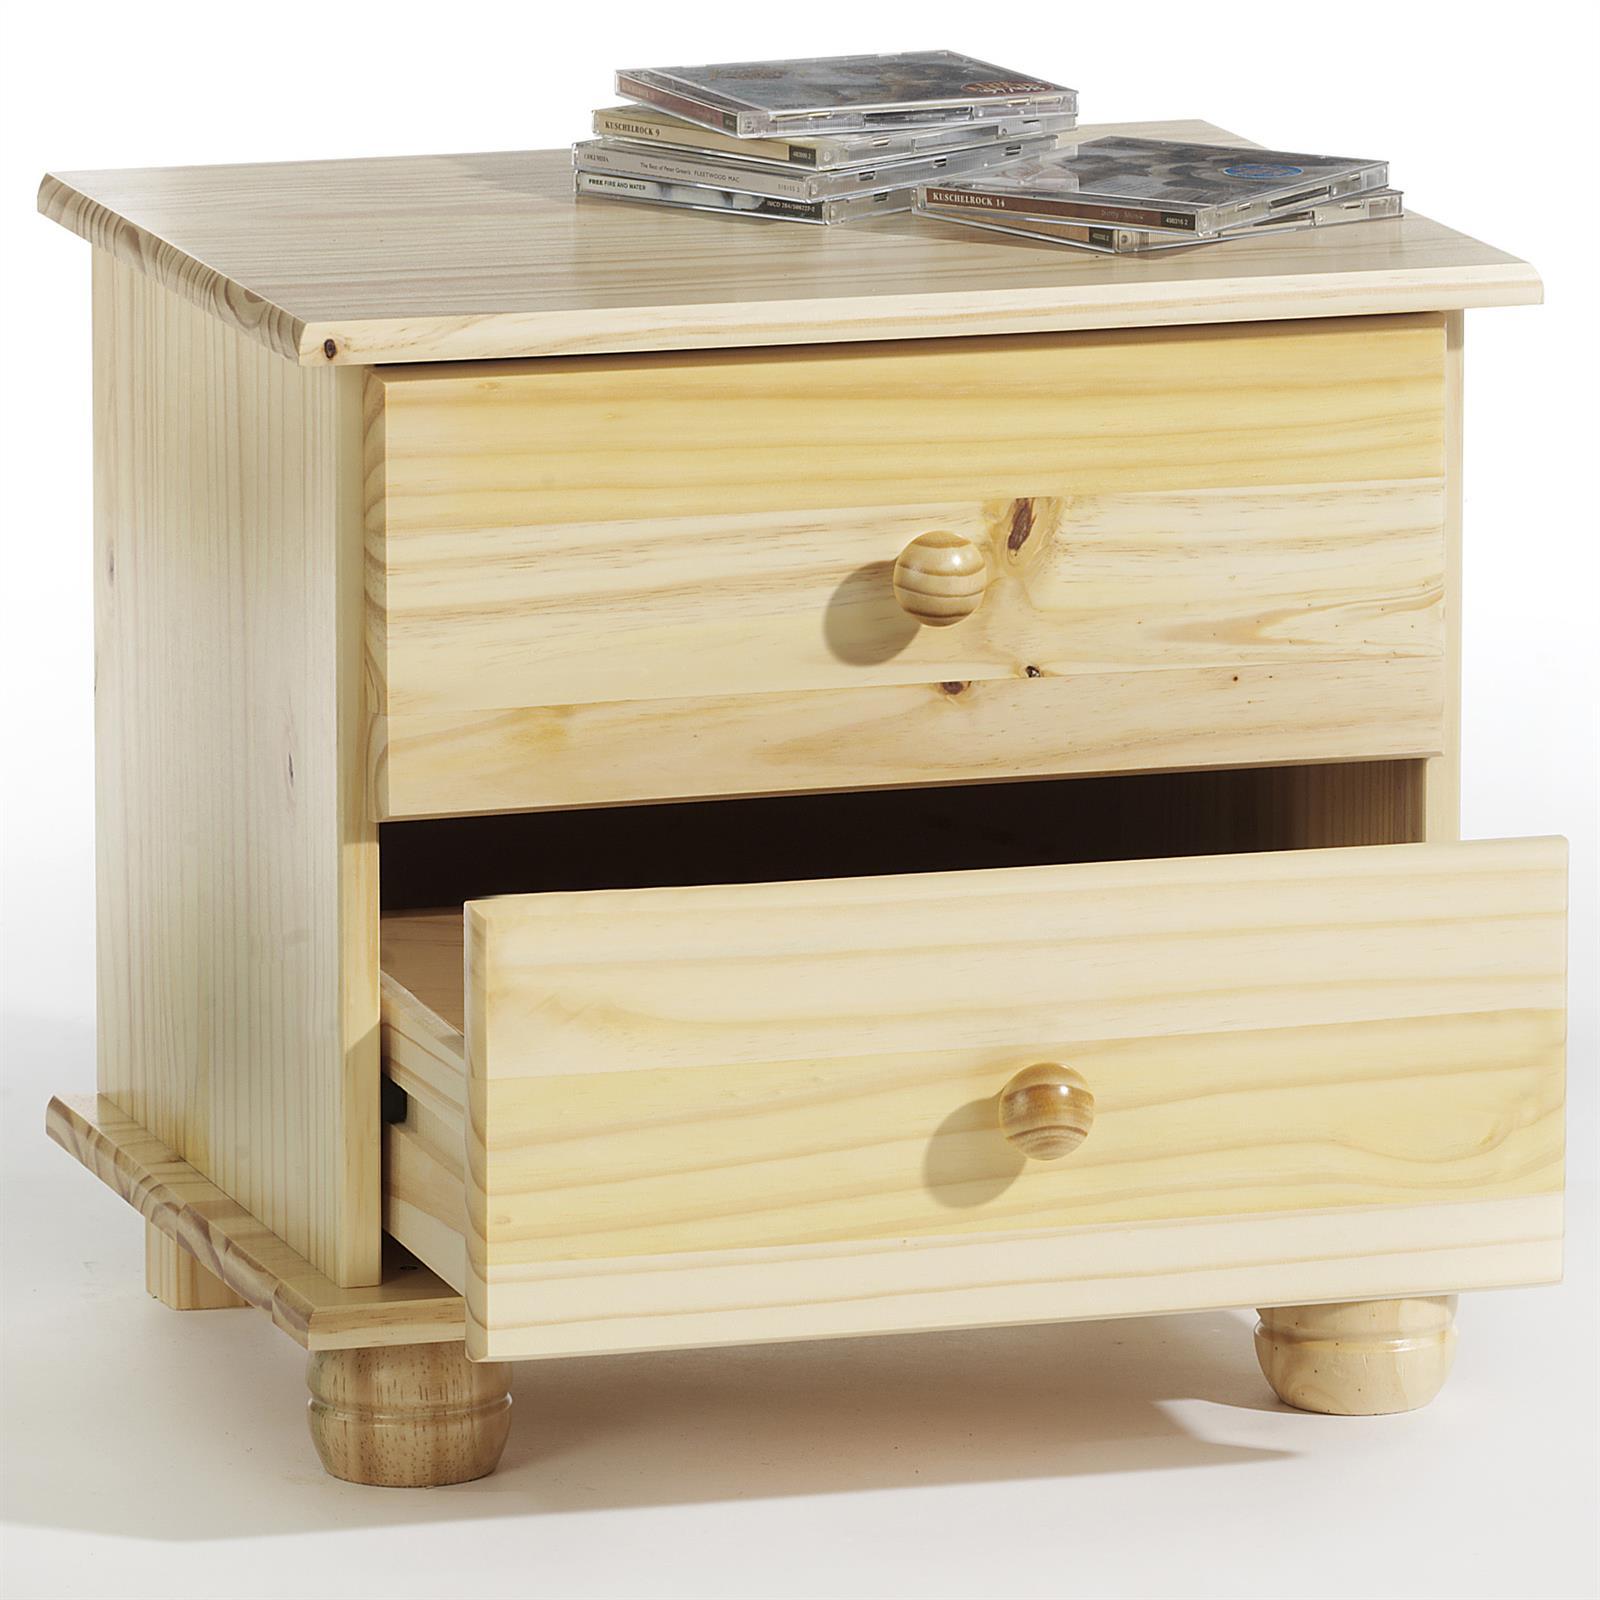 Table de chevet en pin bern vernis naturel mobilia24 - Table de chevet en pin ...